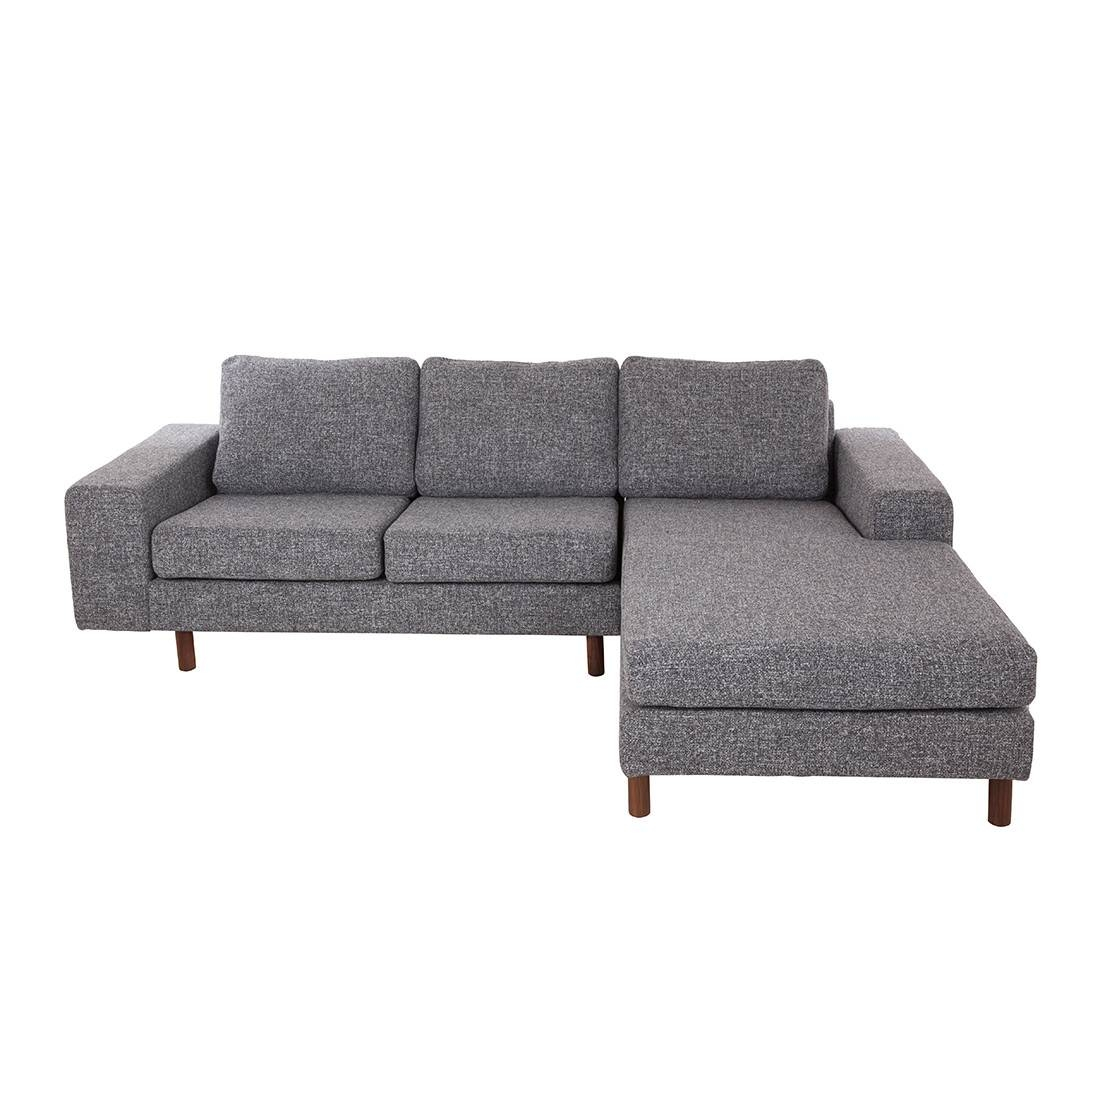 Sofas: Mid Century Settee | Mid Century Sofas | Cheap Mid Century inside Cheap Retro Sofas (Image 16 of 30)